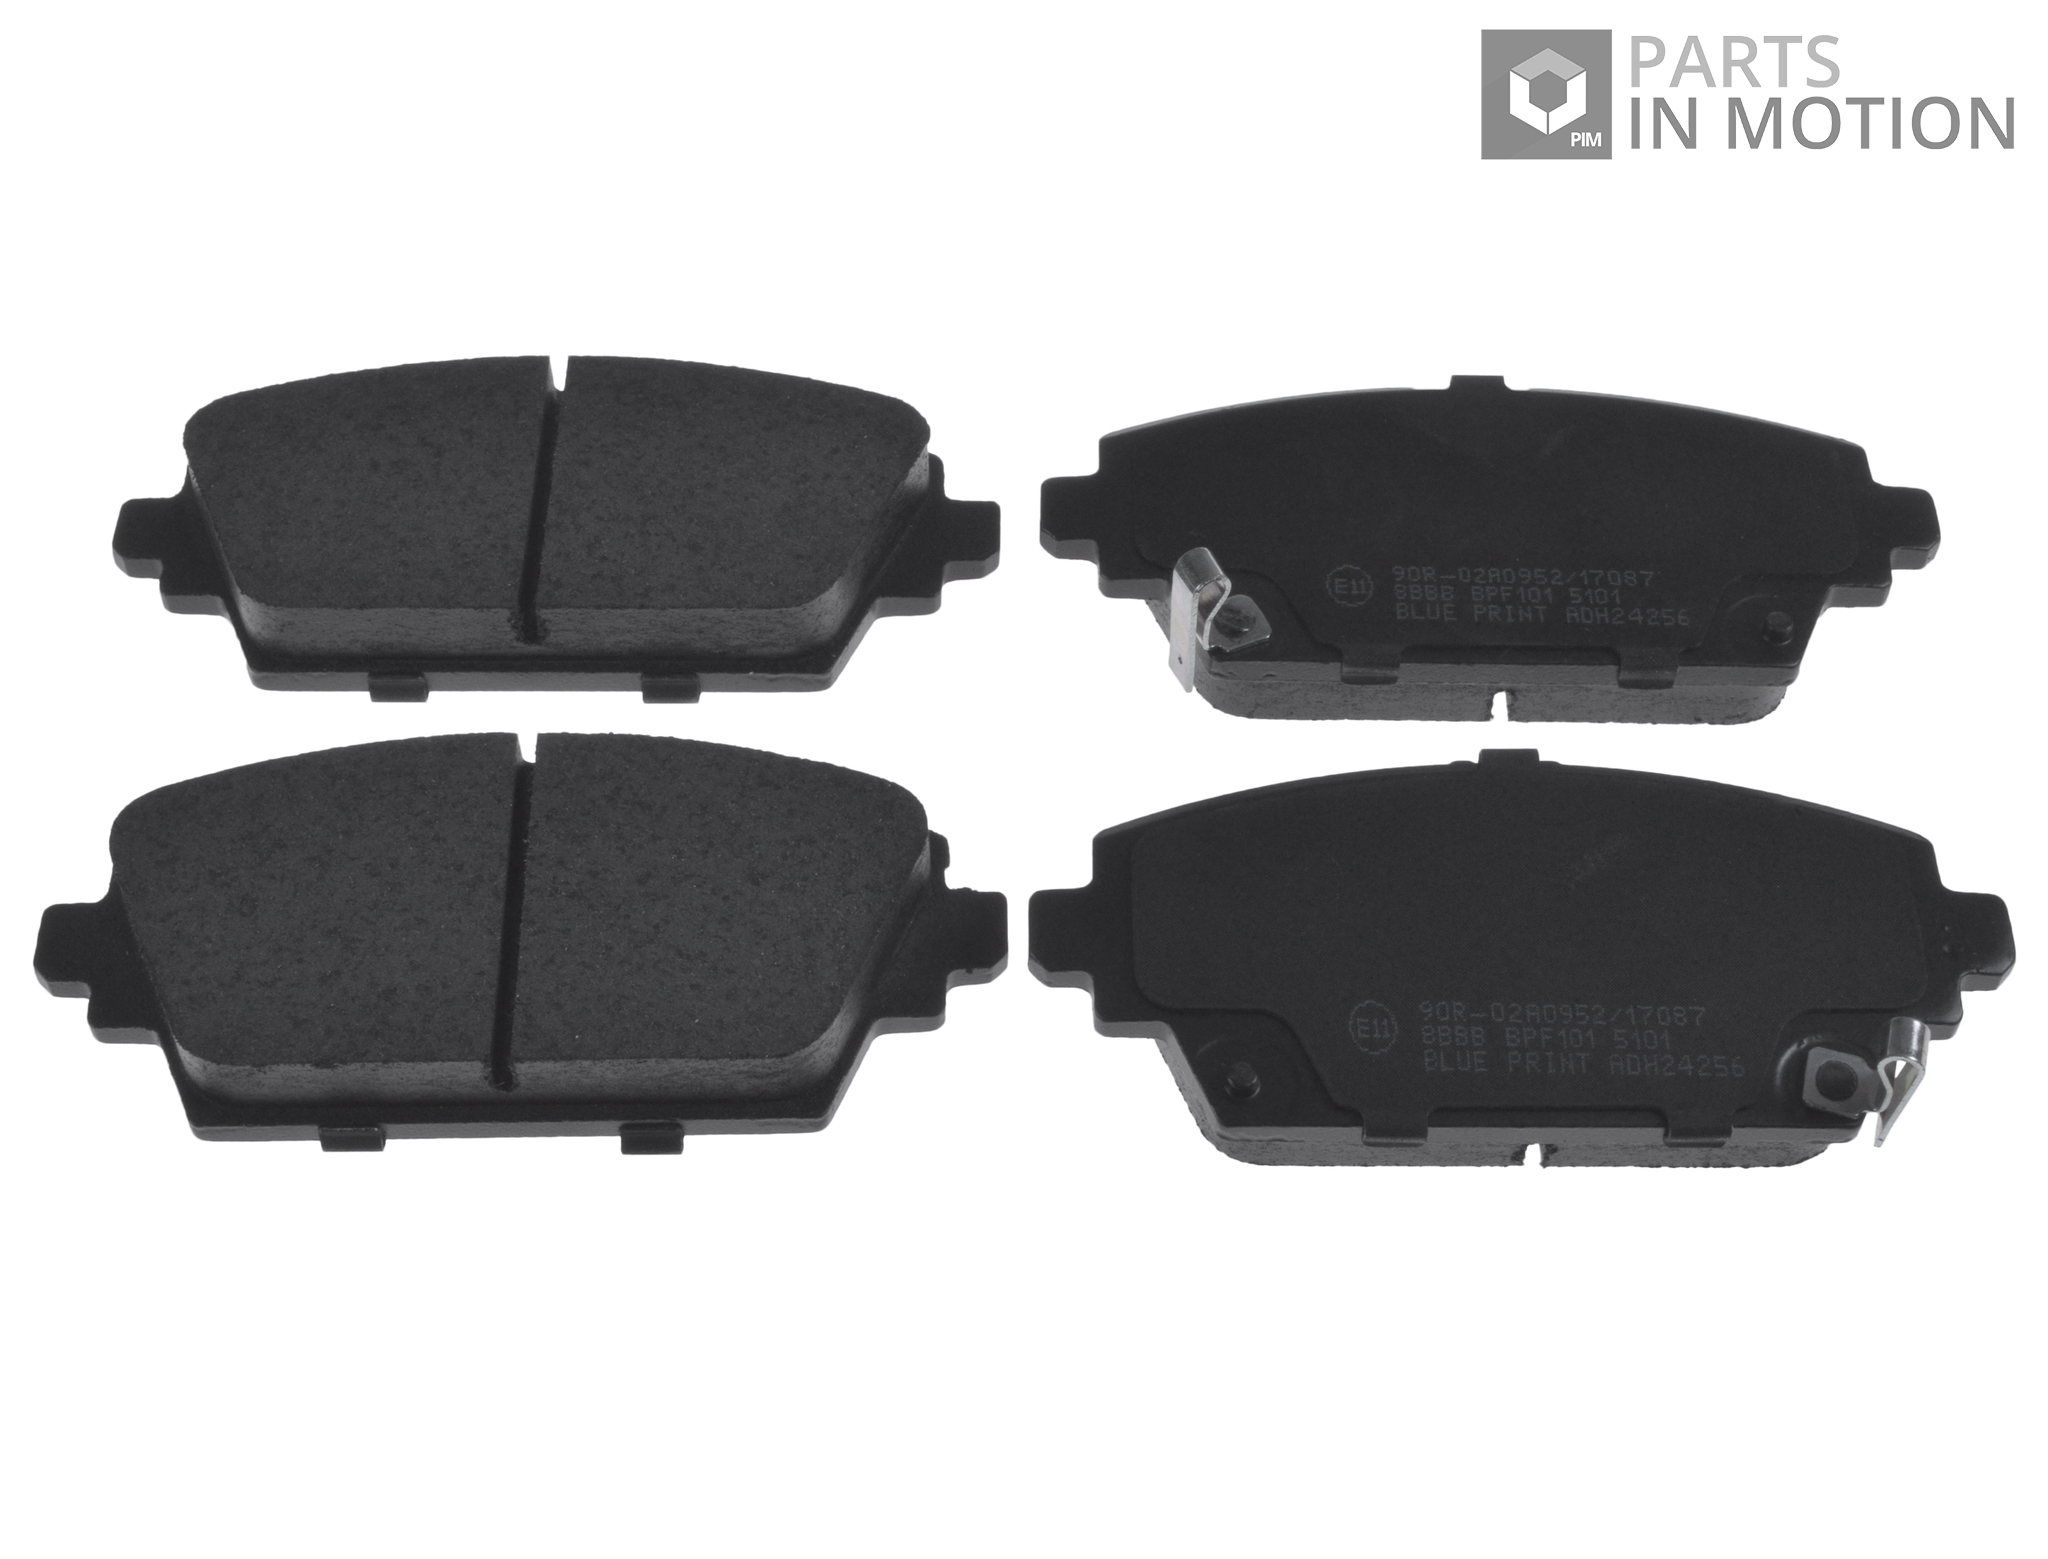 MG ZR 2.0TD Genuine Fahren Rear Brake Pads Set